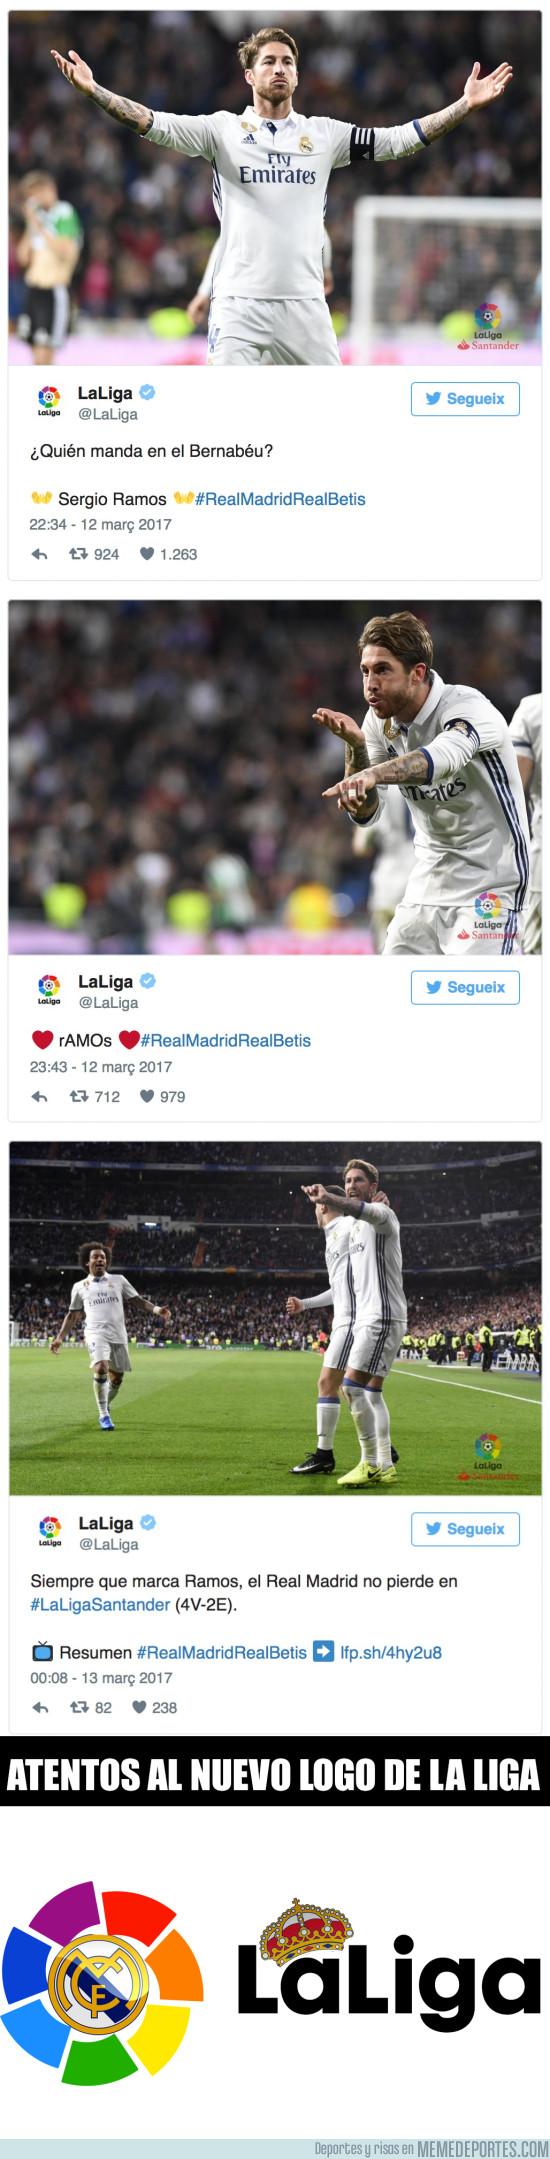 958338 - Polémica máxima por los tuits de LaLiga elogiando con descaro a Ramos